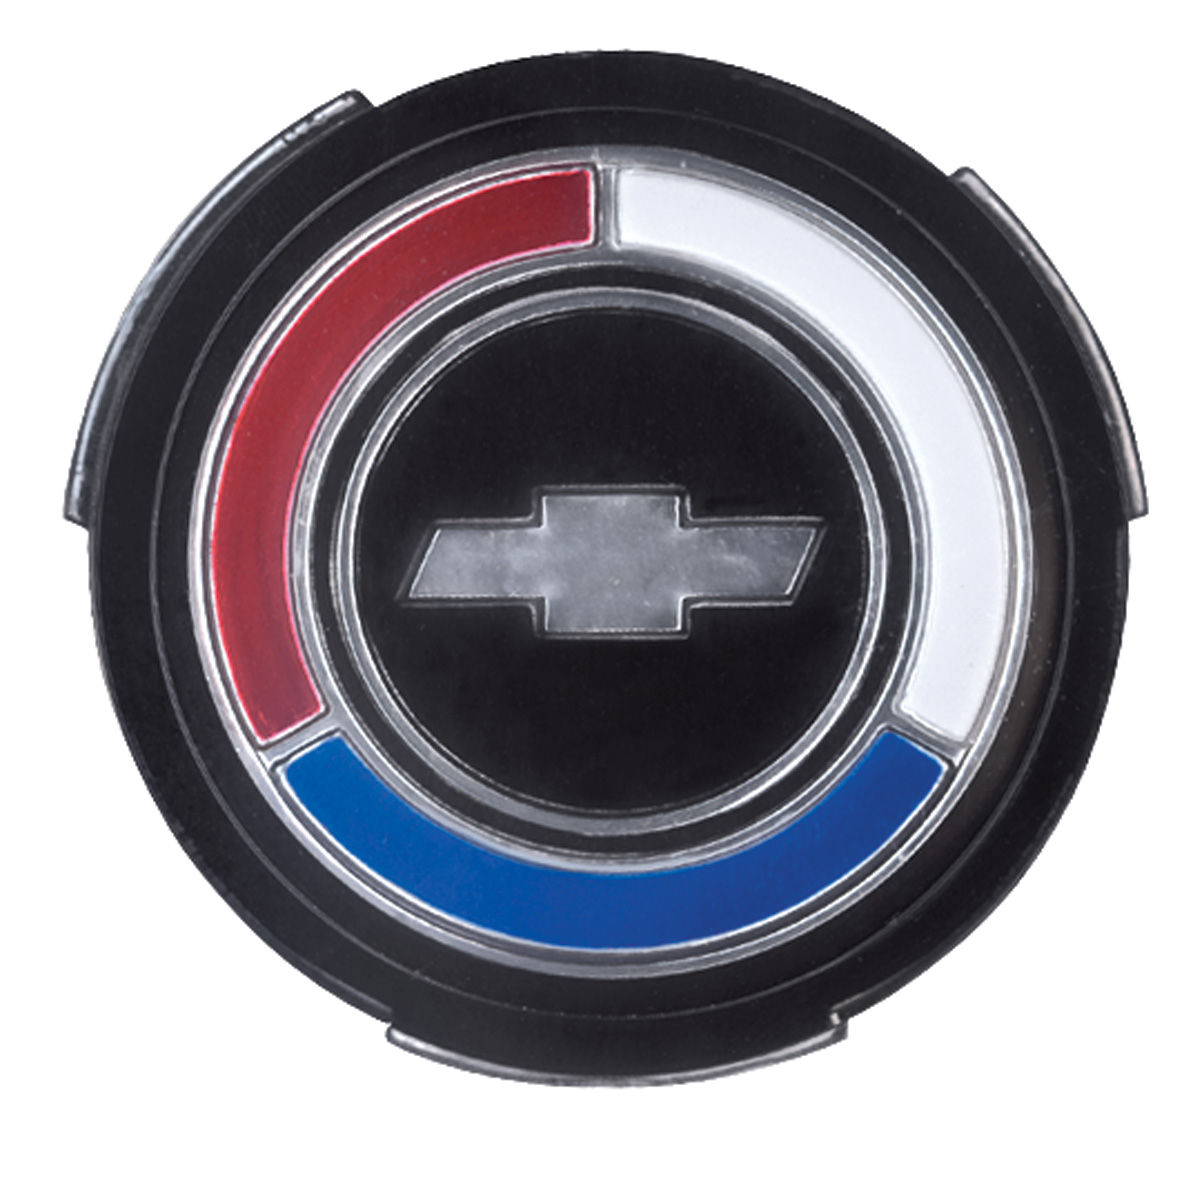 Emblem, Hub Cap, 1967-68 Chevelle, Standard Wheel